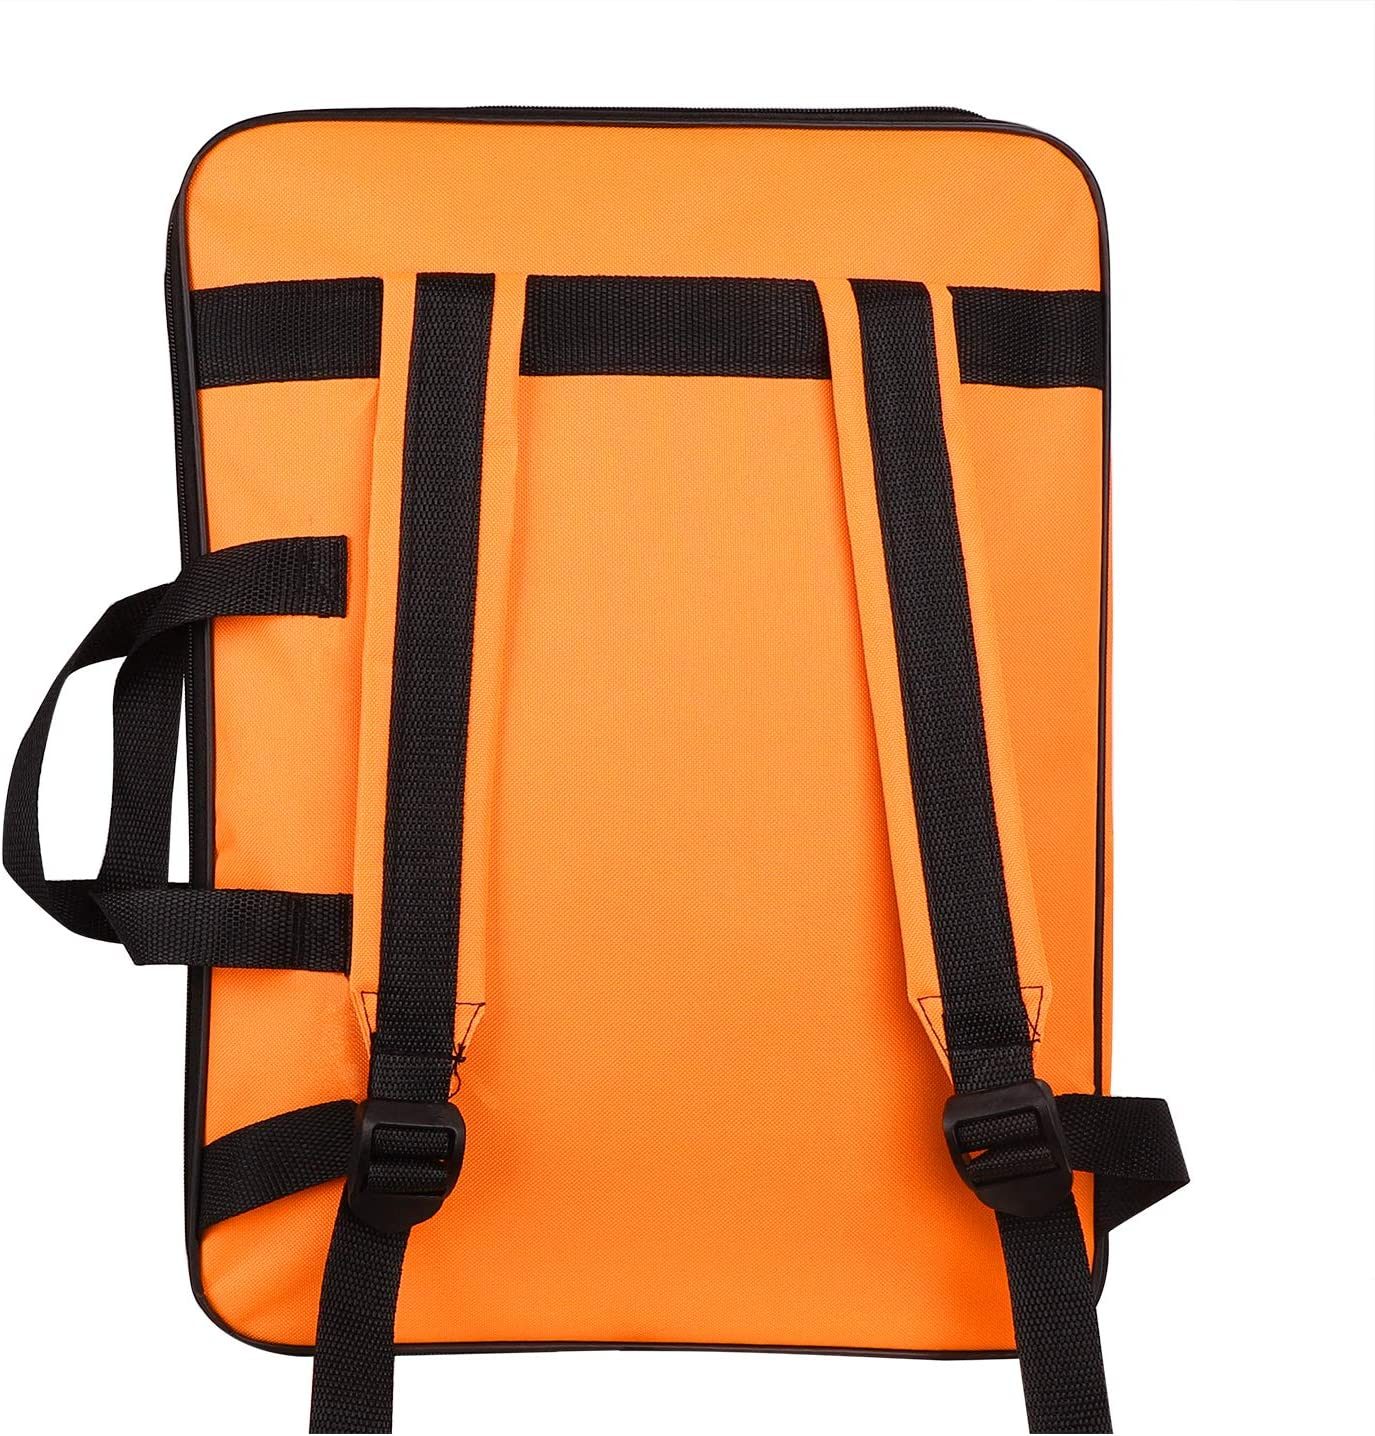 Orange Water-Resistant Art Portfolio Carry Bag A3 Student Art Work Portfolio Tote Drawing Board Bag Portable Painting Sketch Pad Storage Bag Professional Art Organizer for Palette Paints Brushes